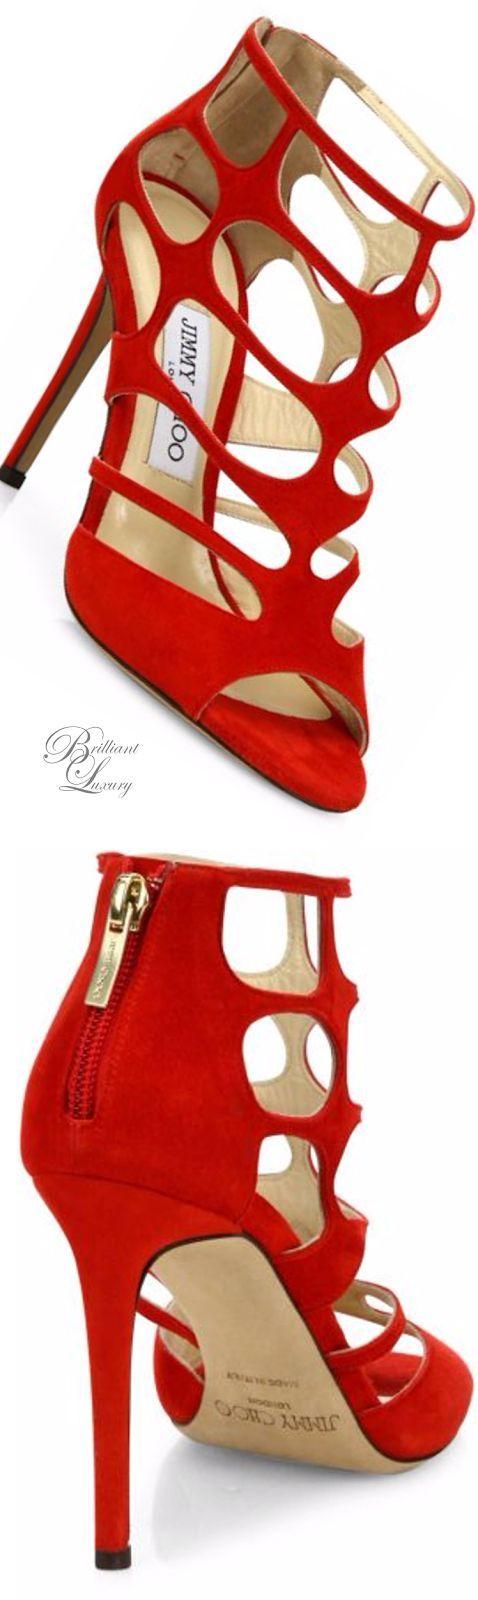 Brilliant Luxury * Jimmy Choo 'Suede Cutout Peep-Toe Sandals' SS 2016